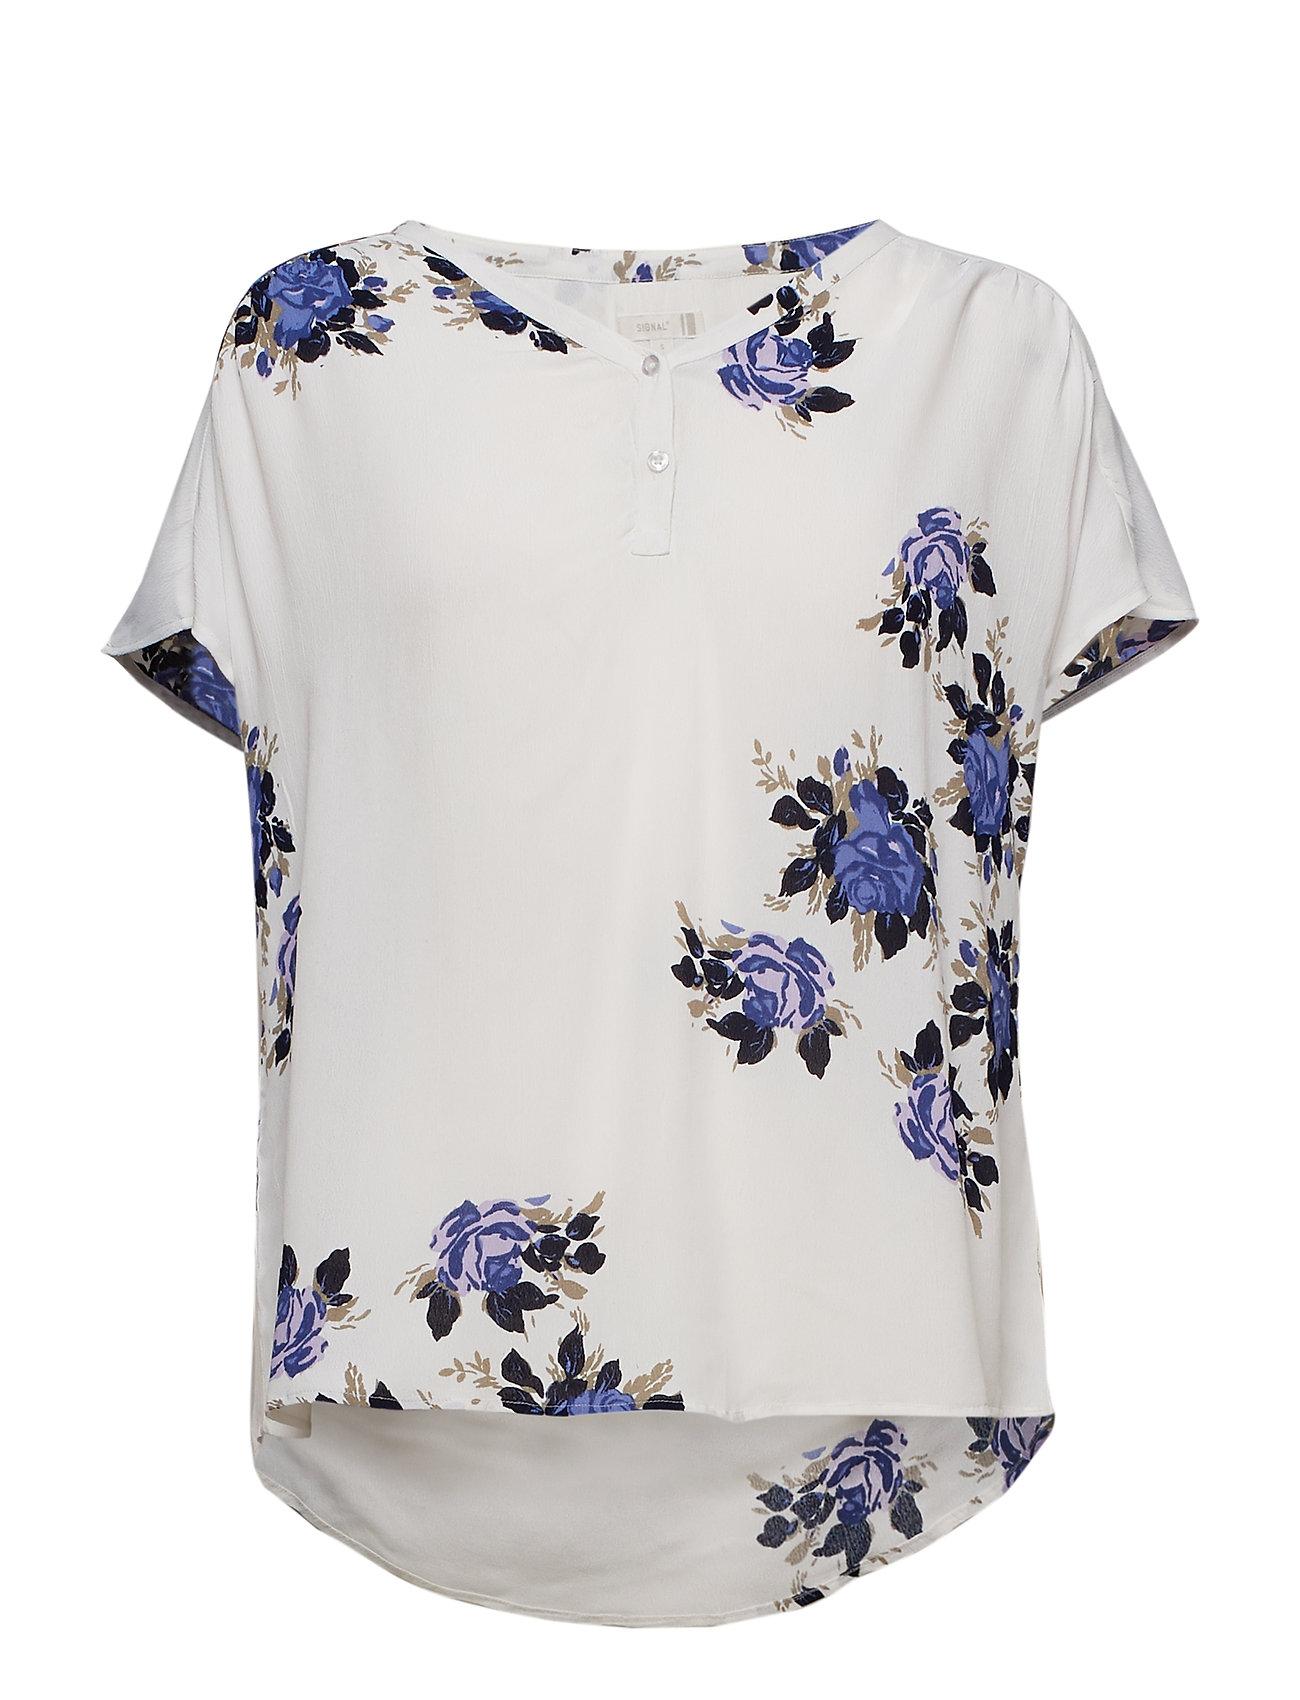 Image of Shirts T-shirt Top Blå Signal (3133209305)